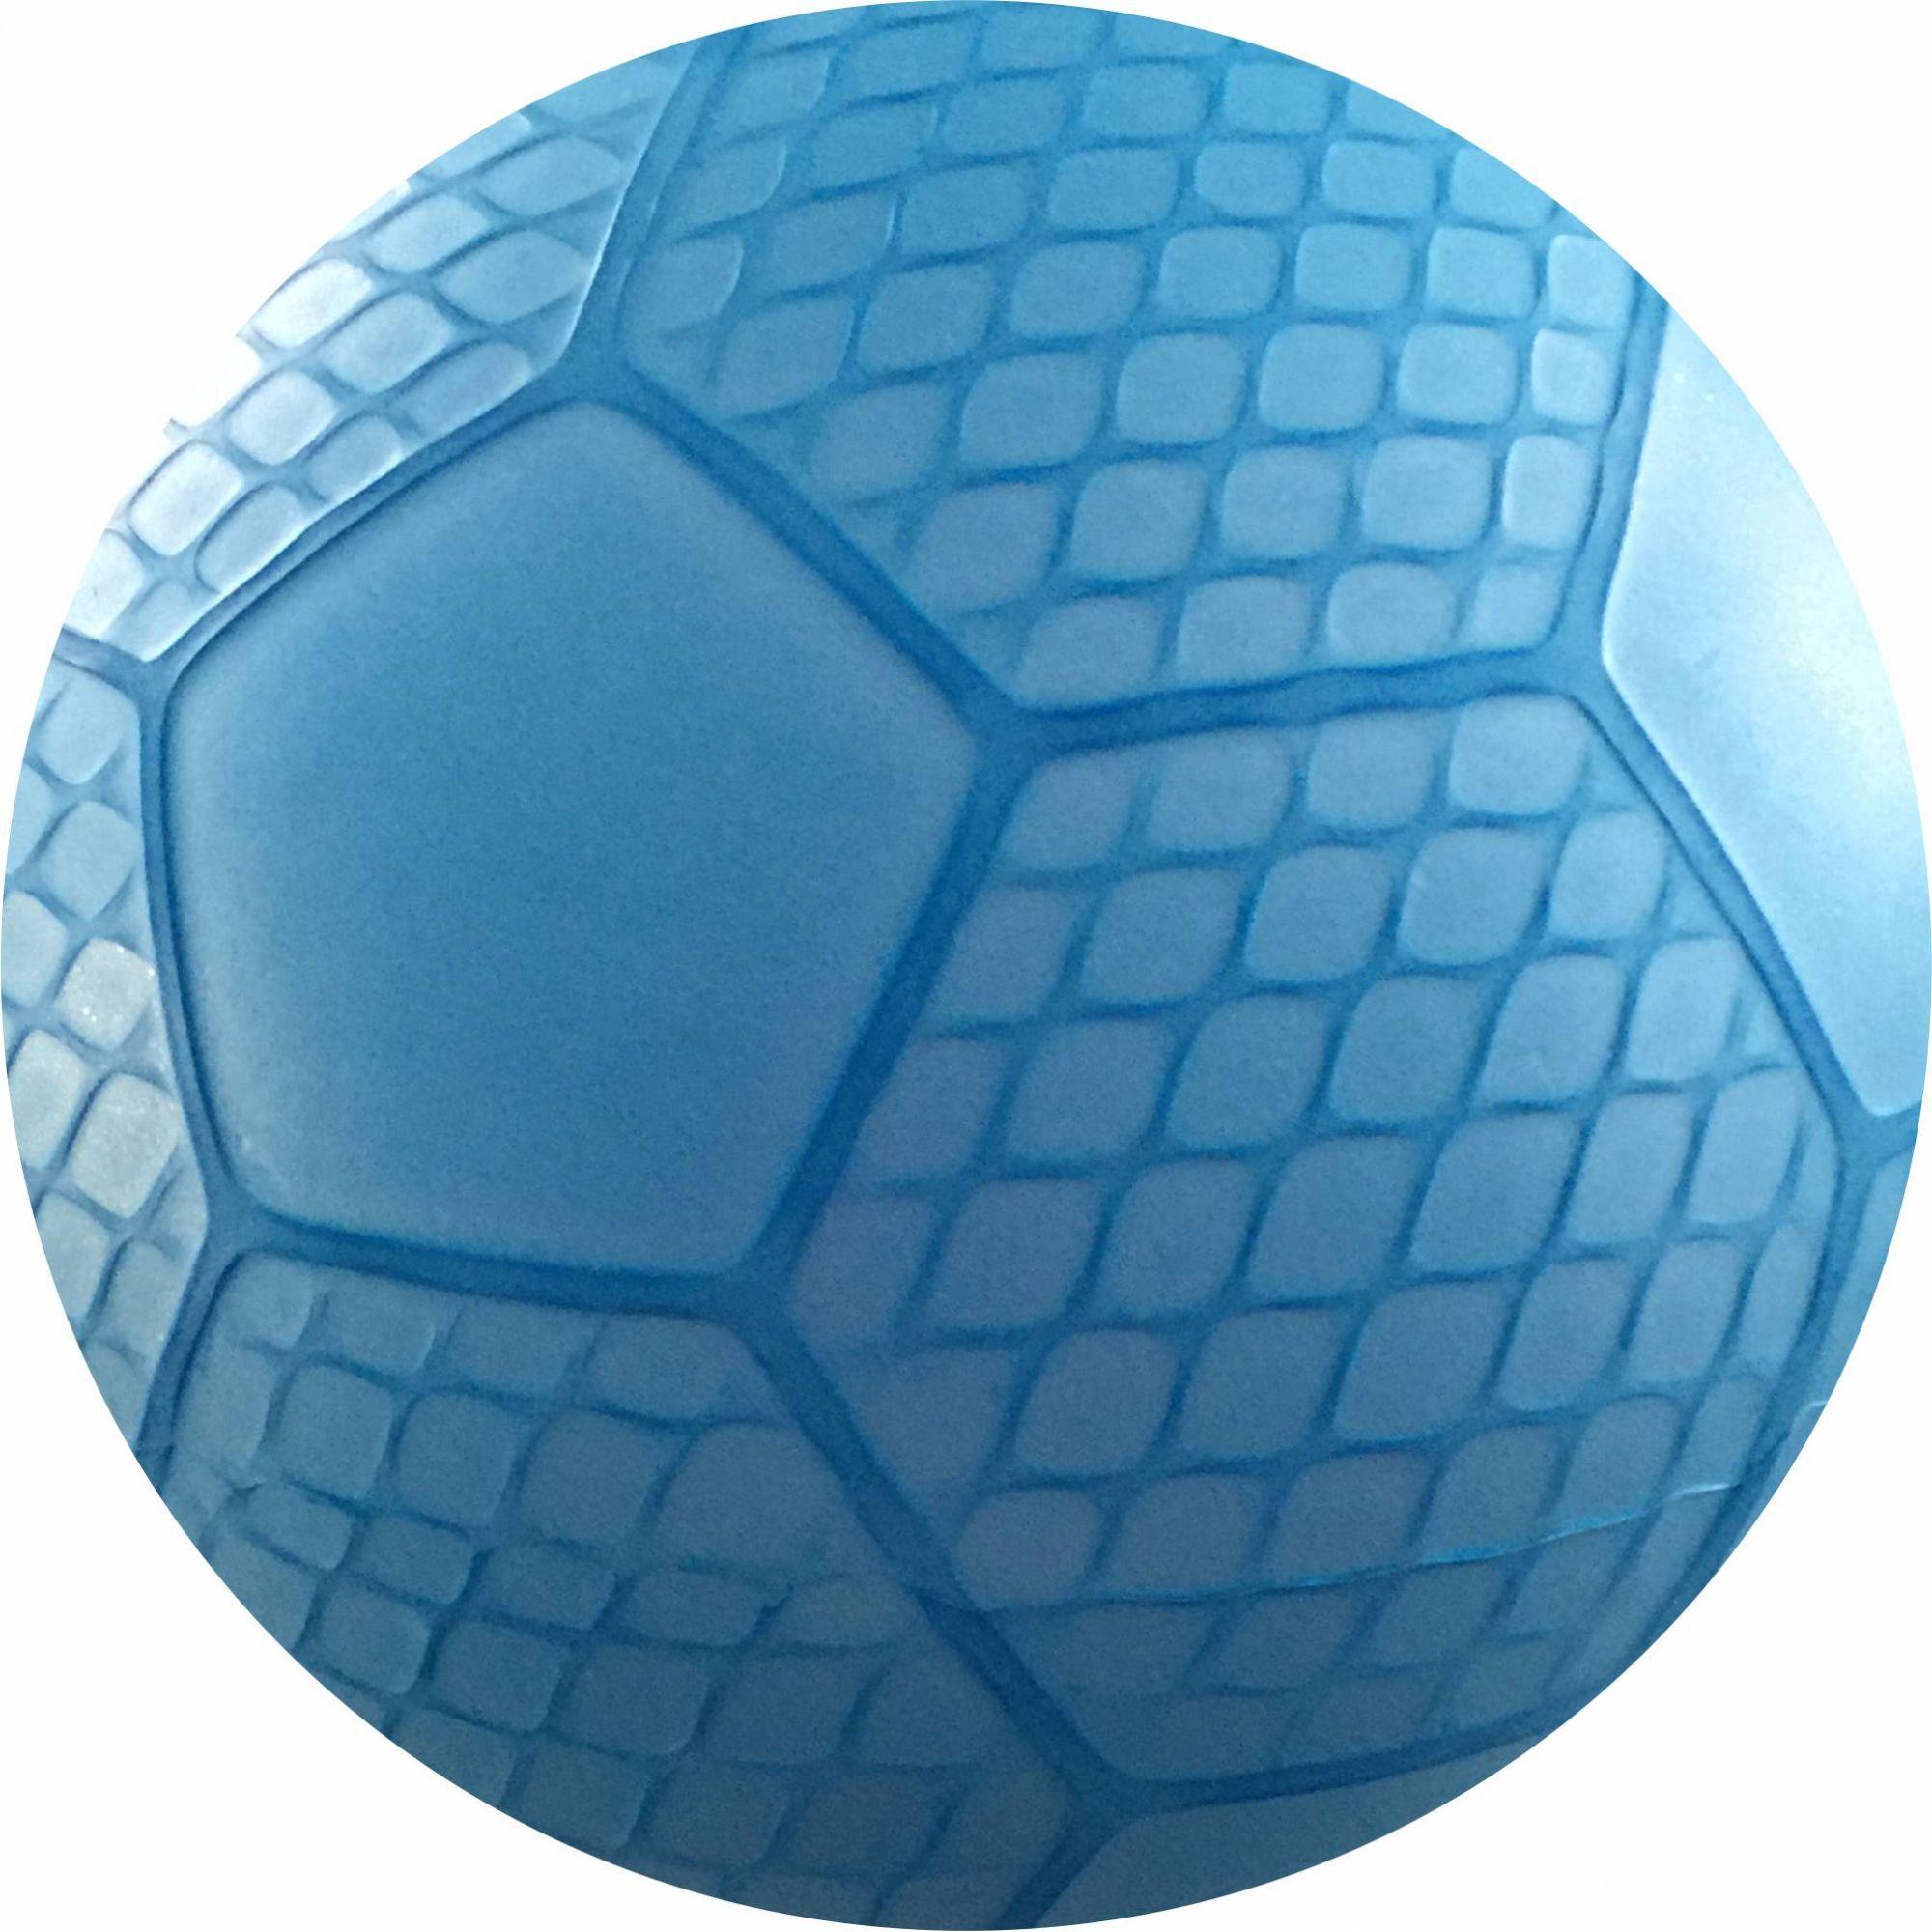 Bola de Vinil Favo de Mel kit com 10 unidades